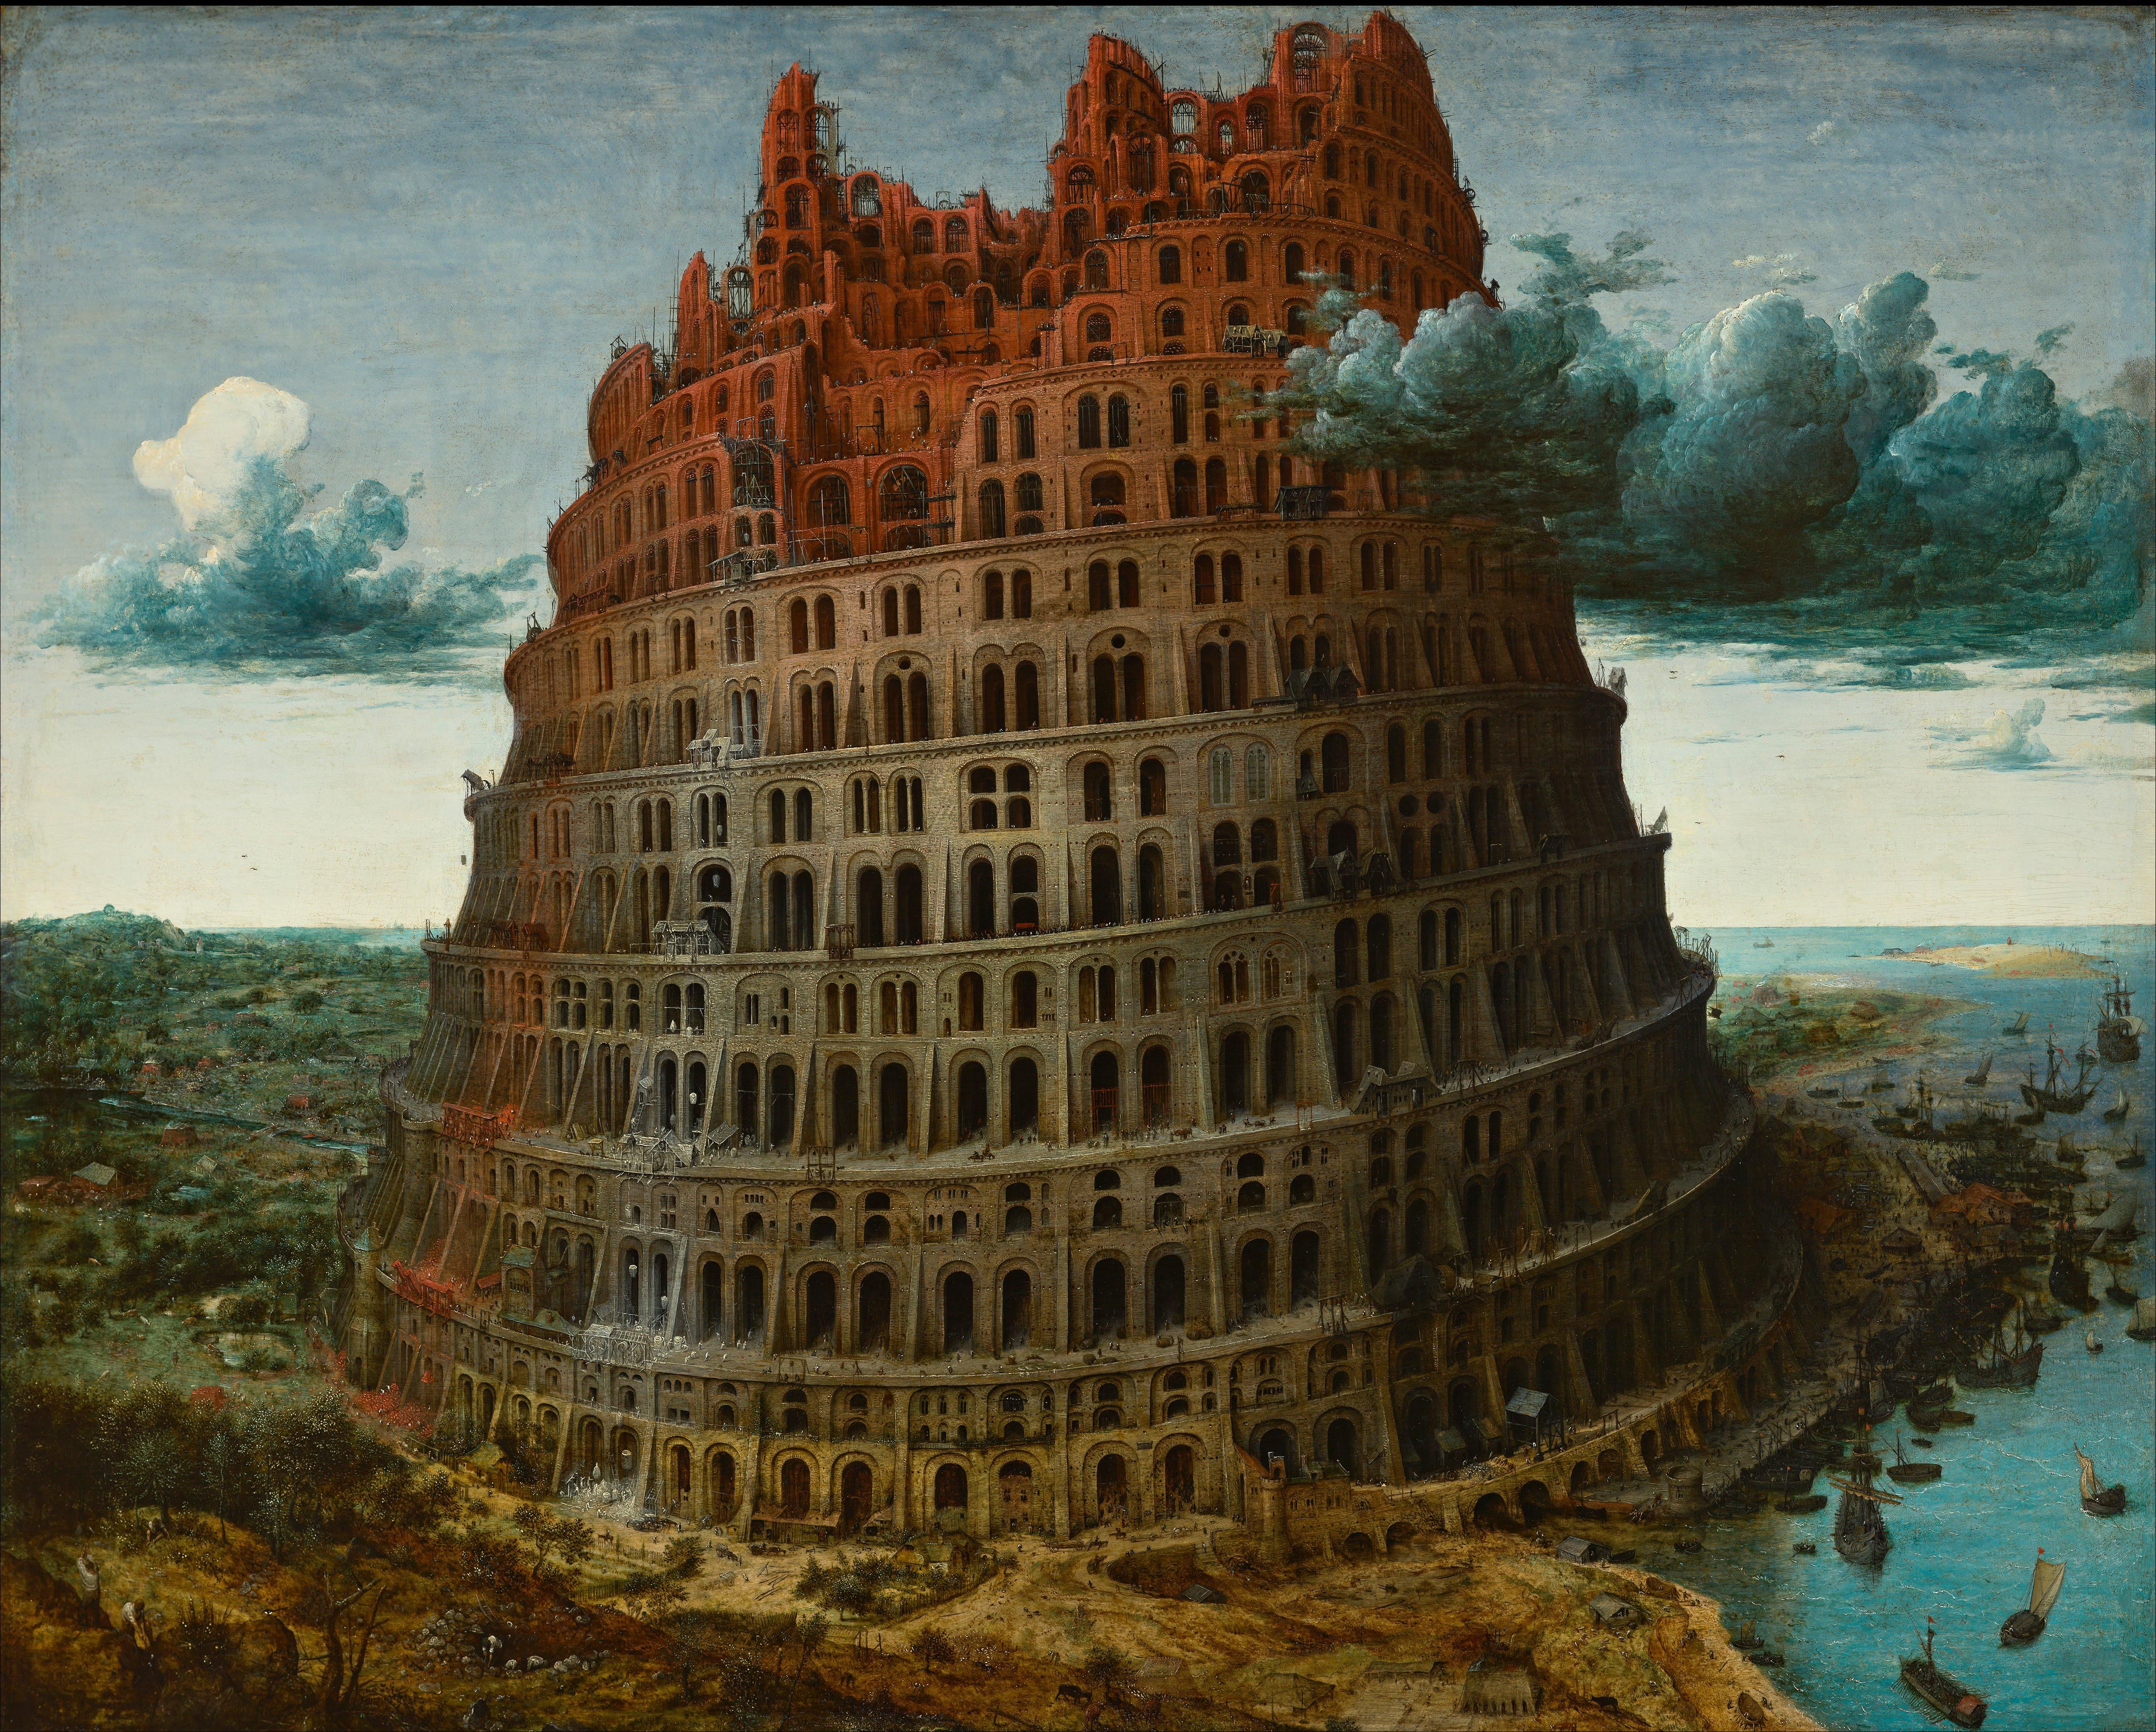 https://upload.wikimedia.org/wikipedia/commons/2/29/Pieter_Bruegel_the_Elder_-_The_Tower_of_Babel_%28Rotterdam%29_-_Google_Art_Project.jpg